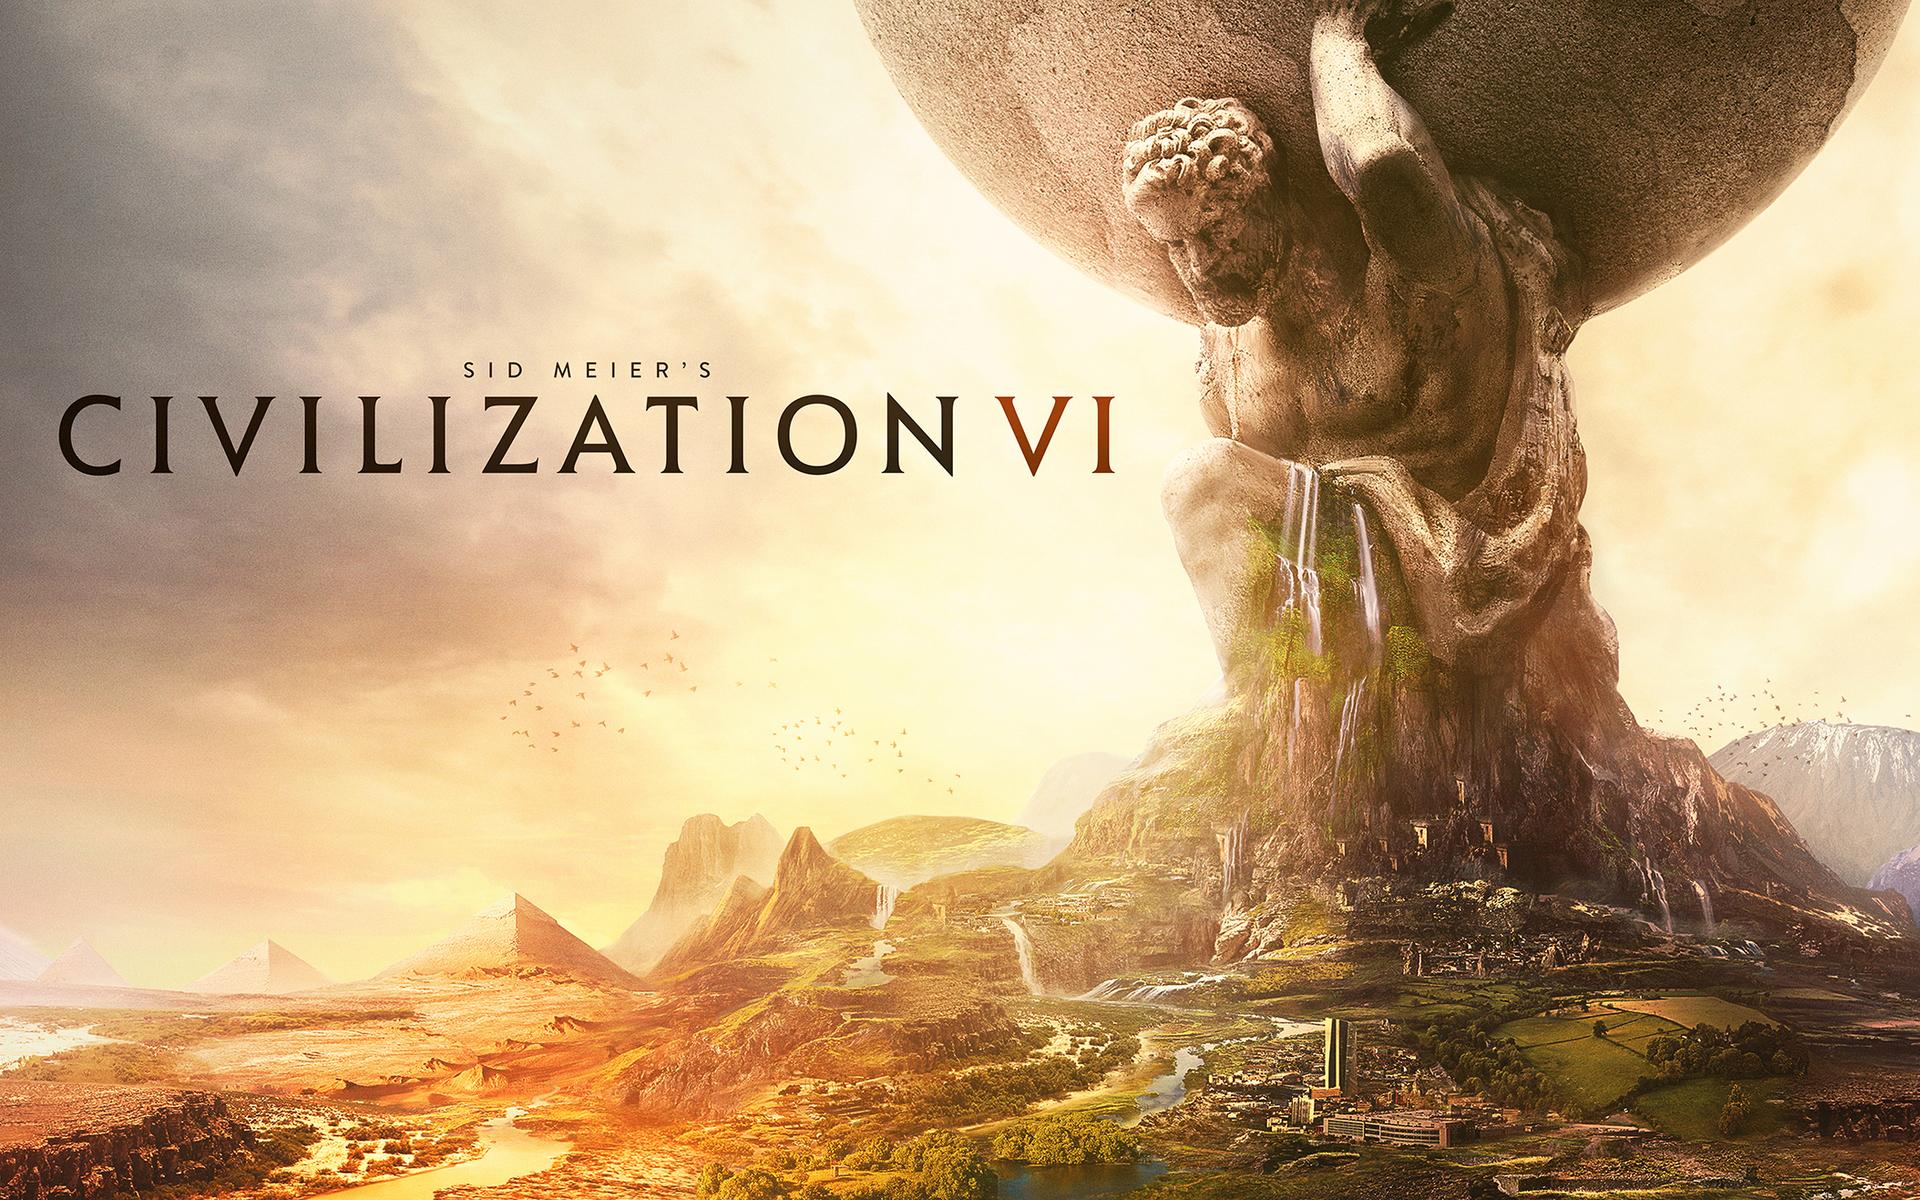 Sid Meier's Civilization VI Screenshots